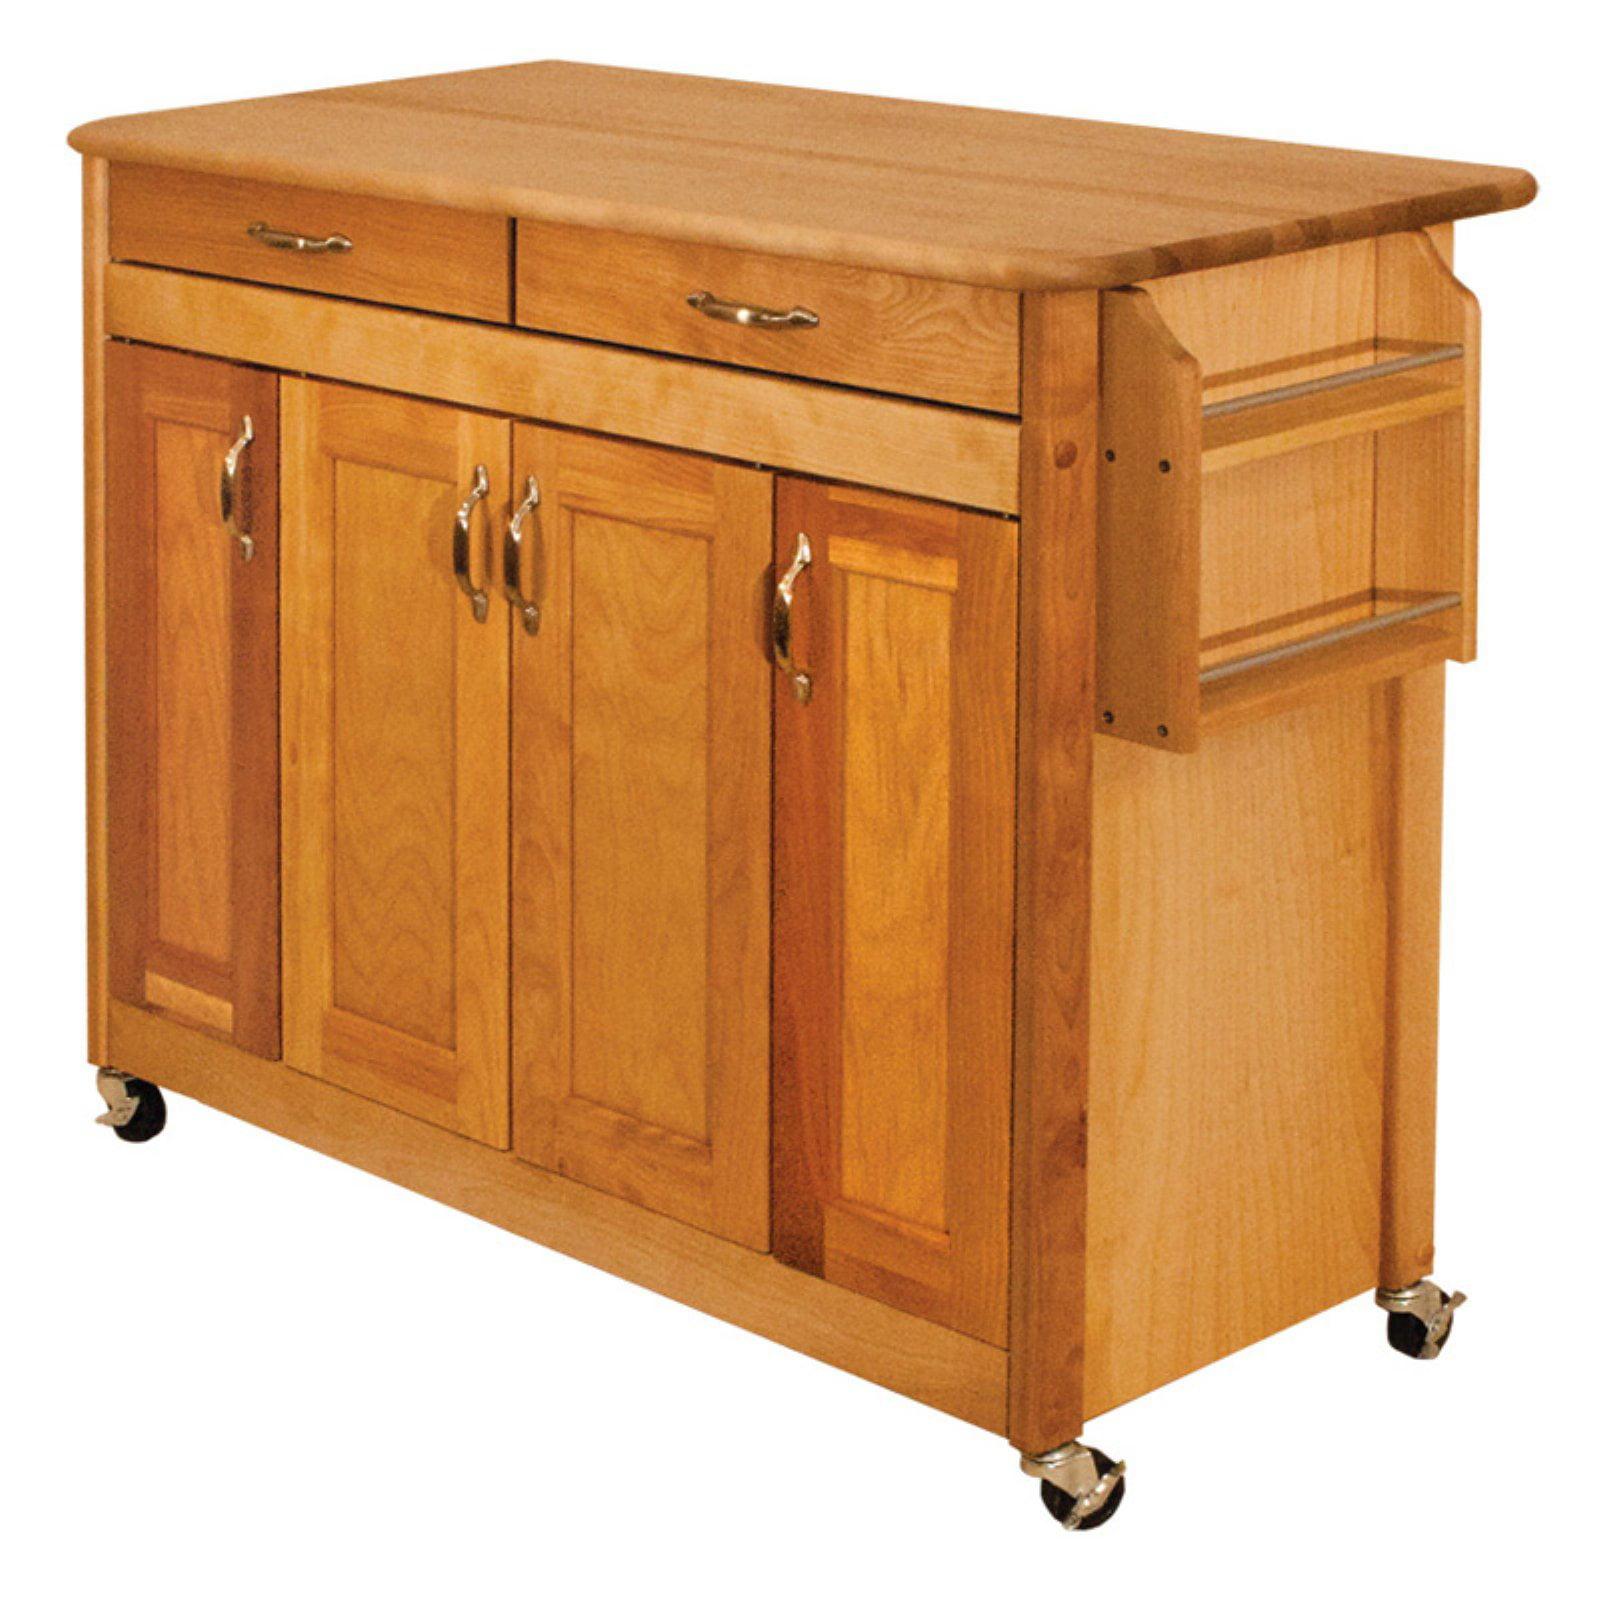 Catskill Craftsman Butcher Block Island with Panel Doors Portable Kitchen Cart by Catskill Craftsmen